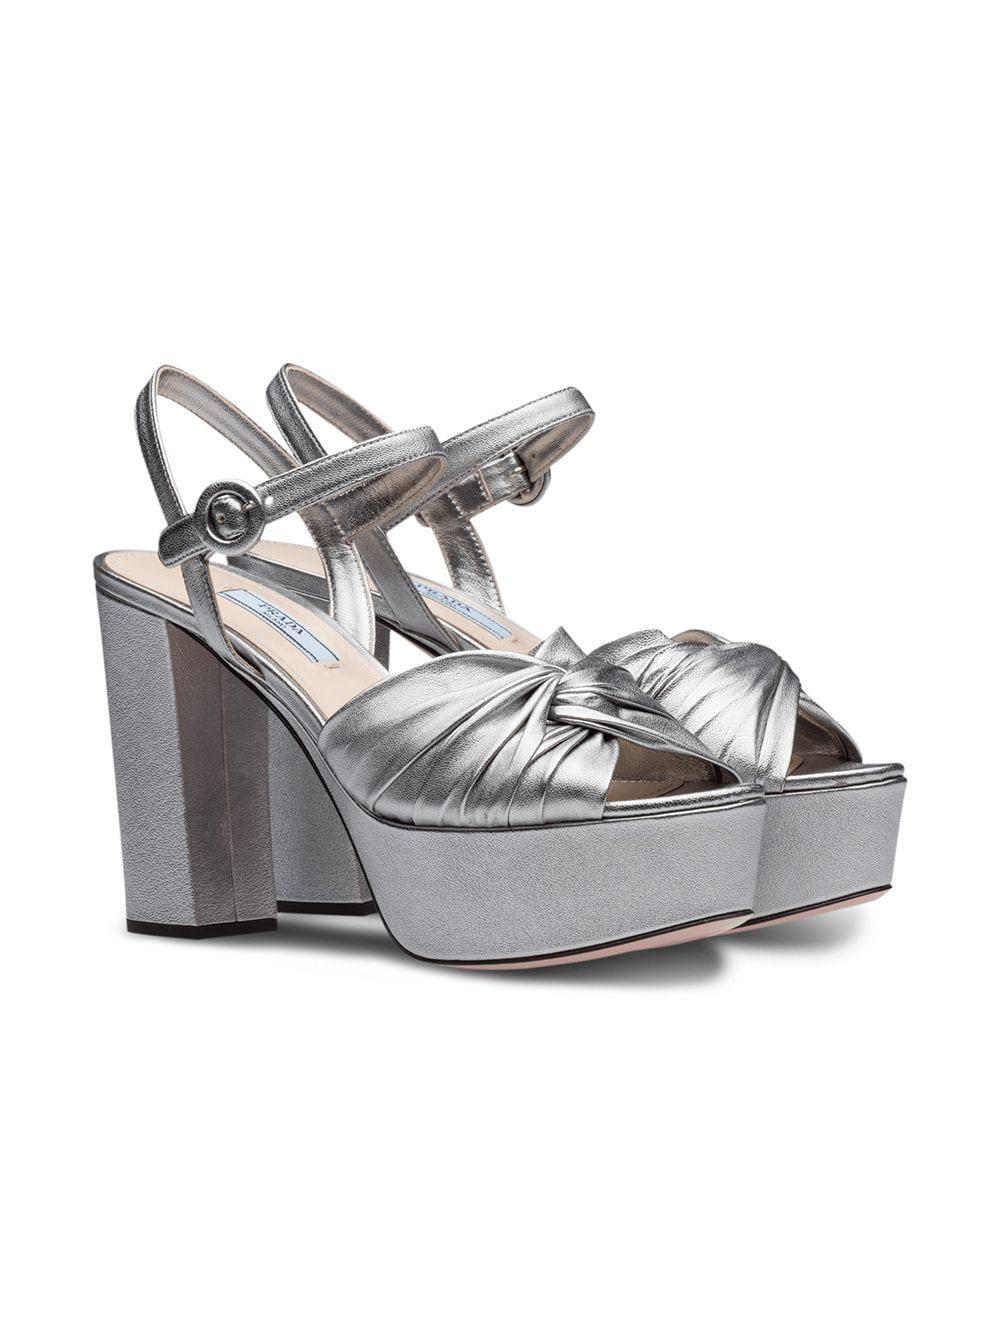 e848d0ac958 Lyst - Prada Platform Sandals in Metallic